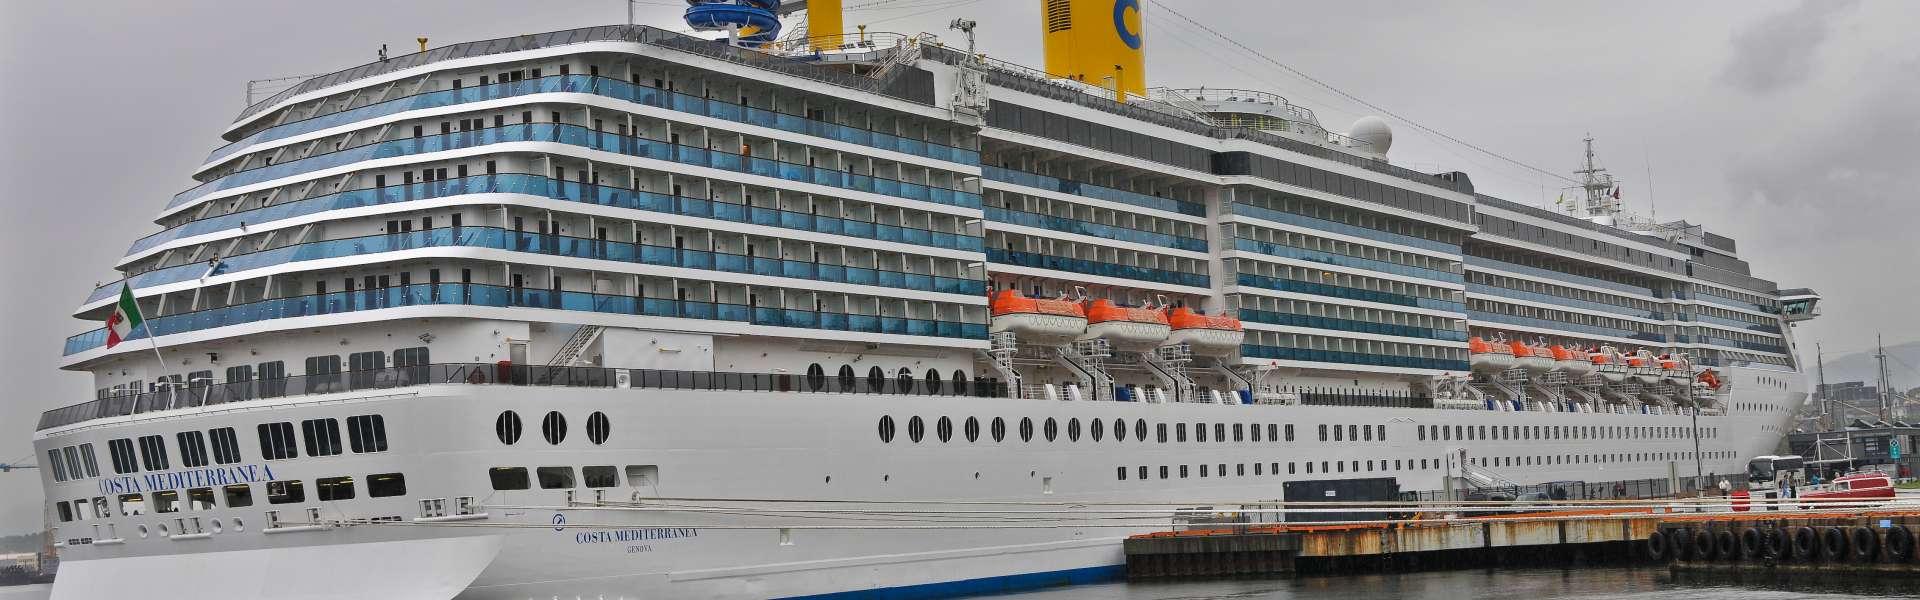 Croaziera 2019 - Asia/Africa si Orientul Mijlociu (Dubai) - Costa Cruises - Costa Mediterranea - 7 nopti